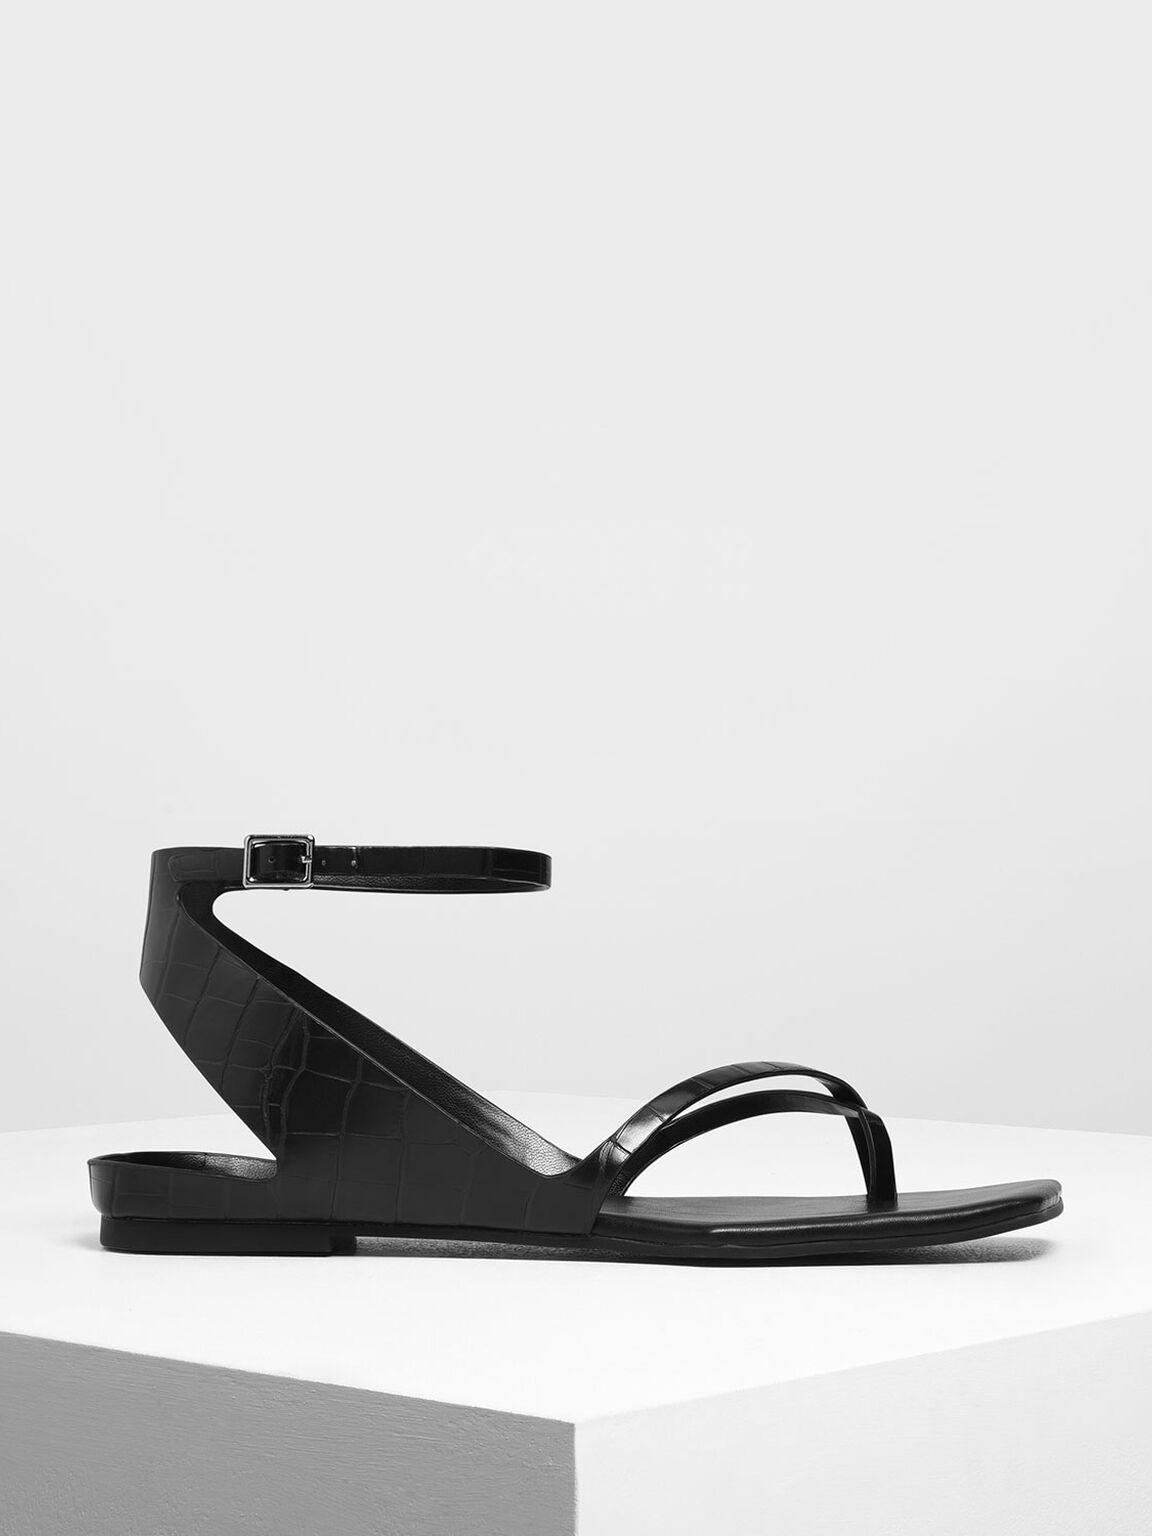 Croc-Effect Ankle Wrap Toe Loop Sandals, Black, hi-res